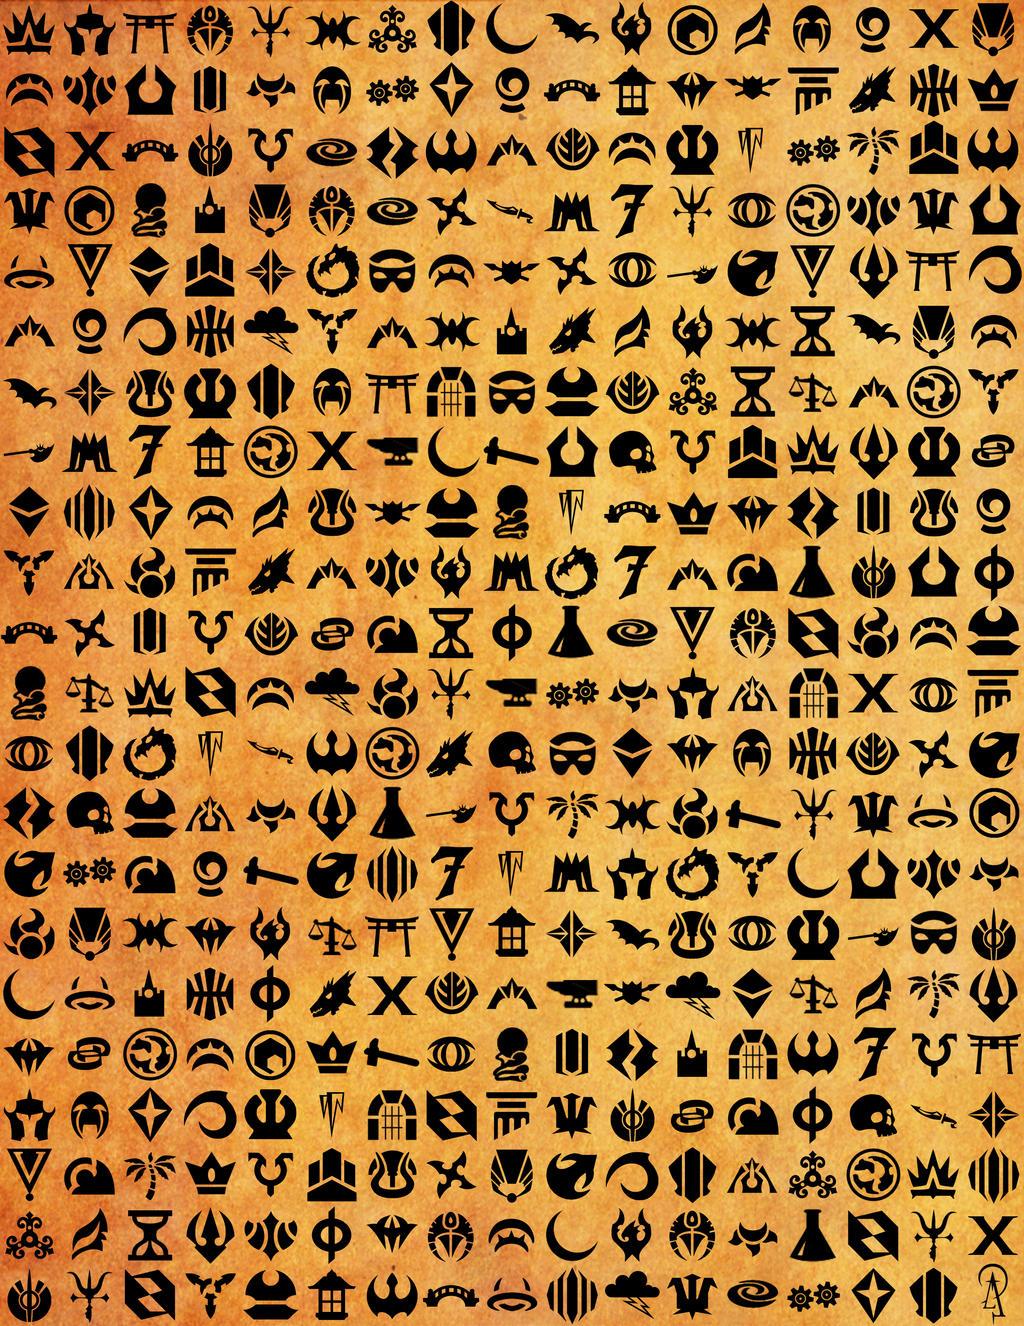 Mtg Guild Symbols  Magic The Gathering  Pinterest  Mtg